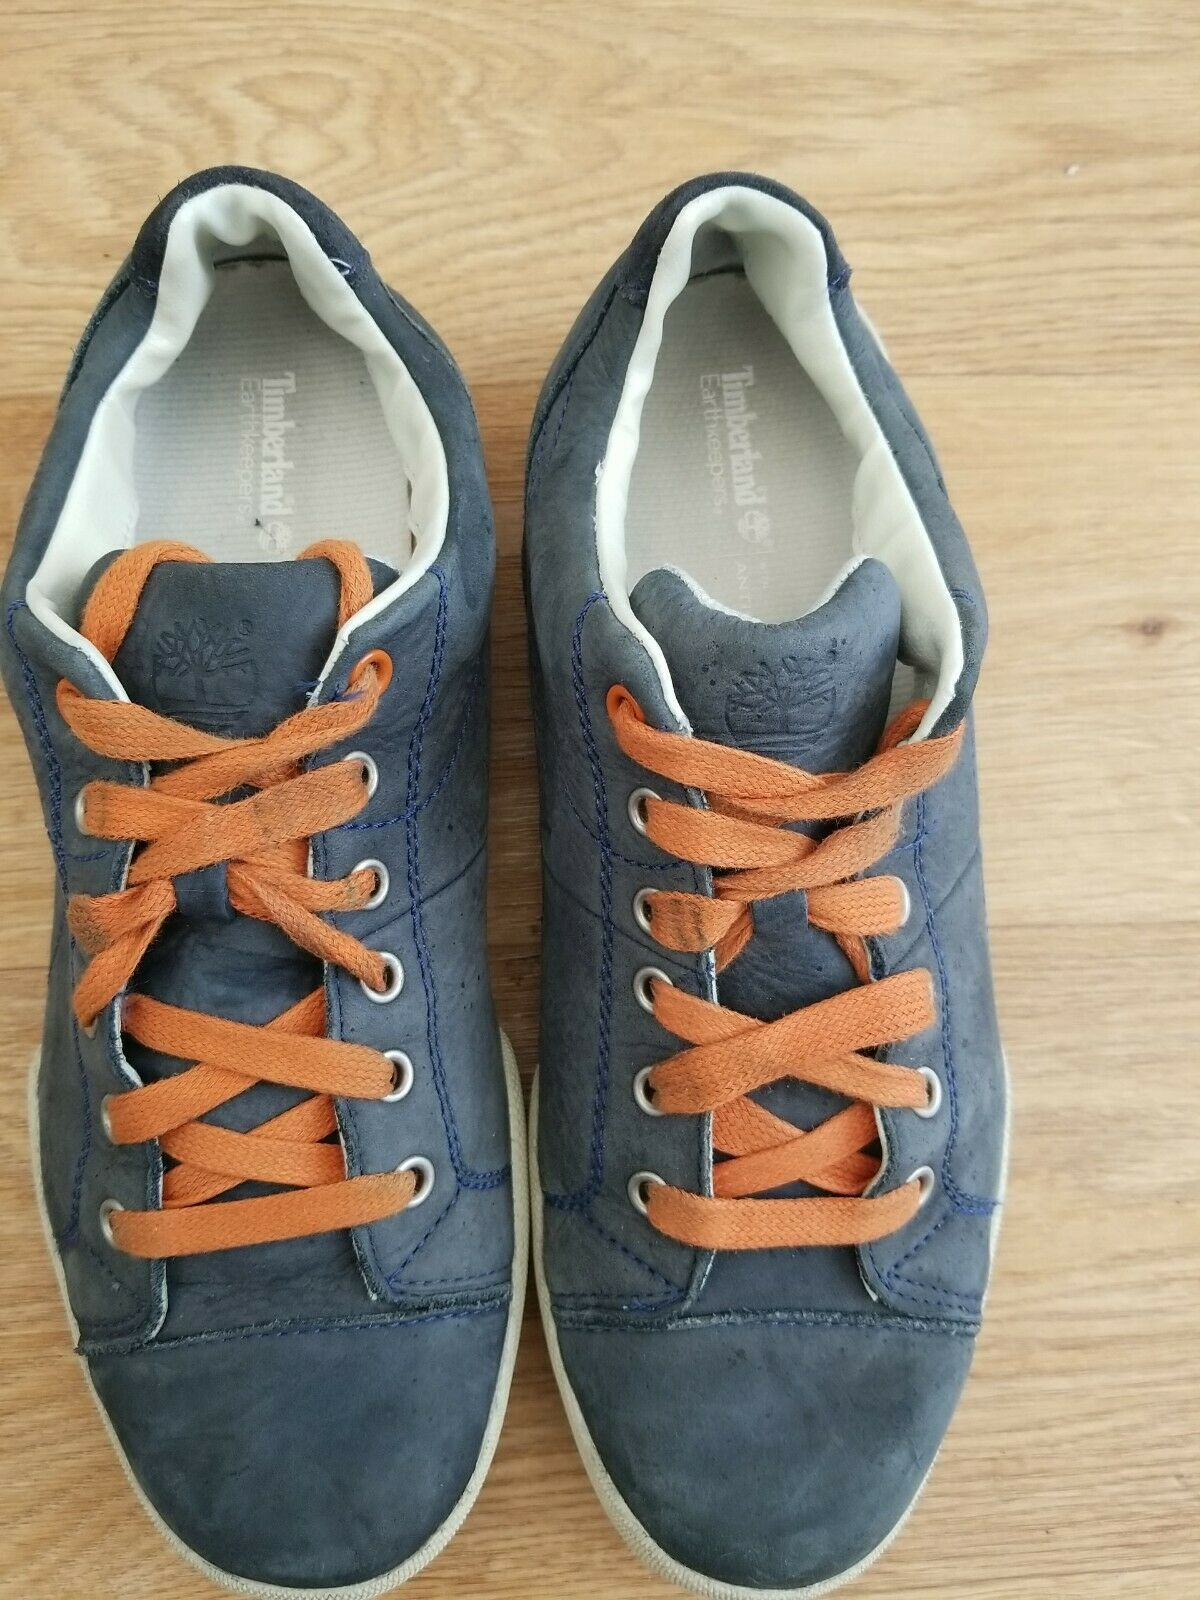 Timberland EK Split Cup Sole FT 5813R men's lace-up shoe UK 8 EUR 42